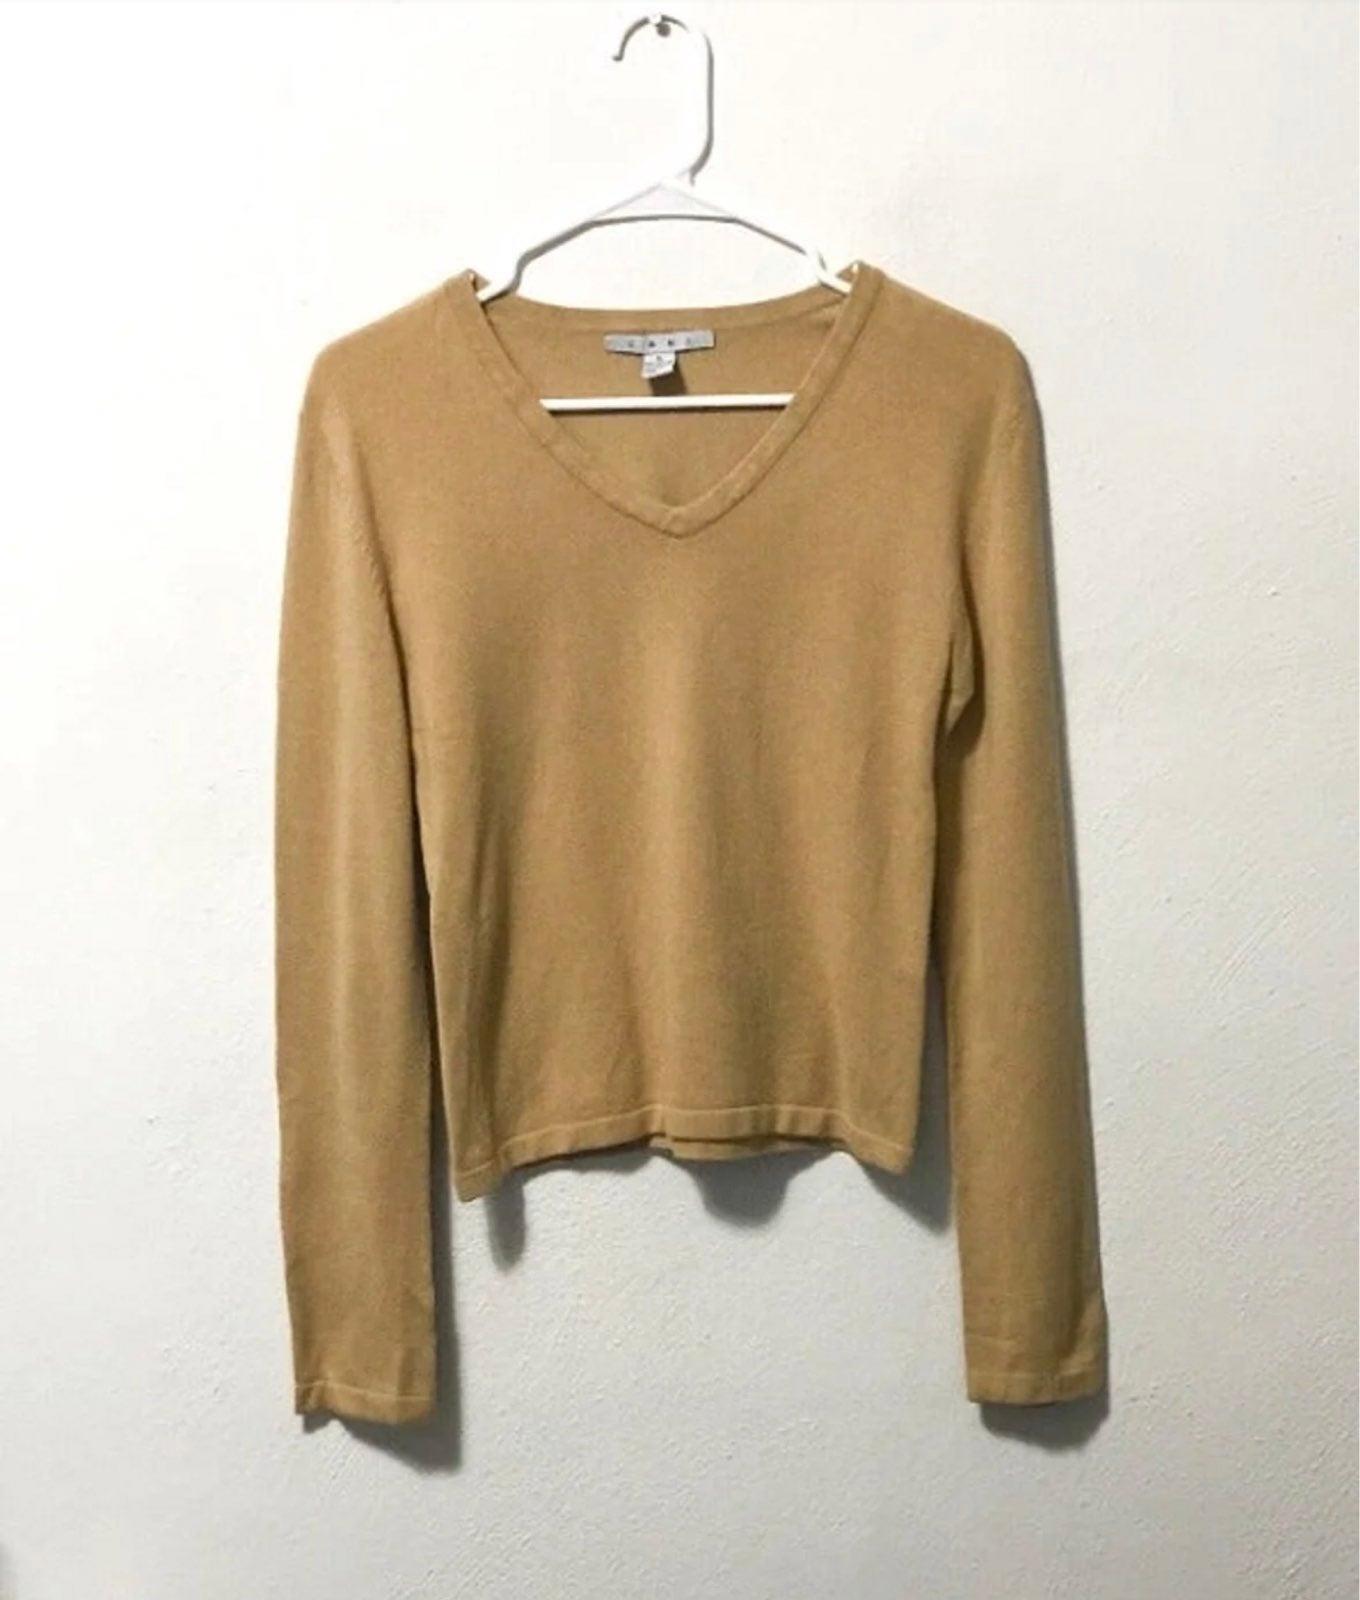 Cabi Tan V-Neck Long Sleeve Sweater M